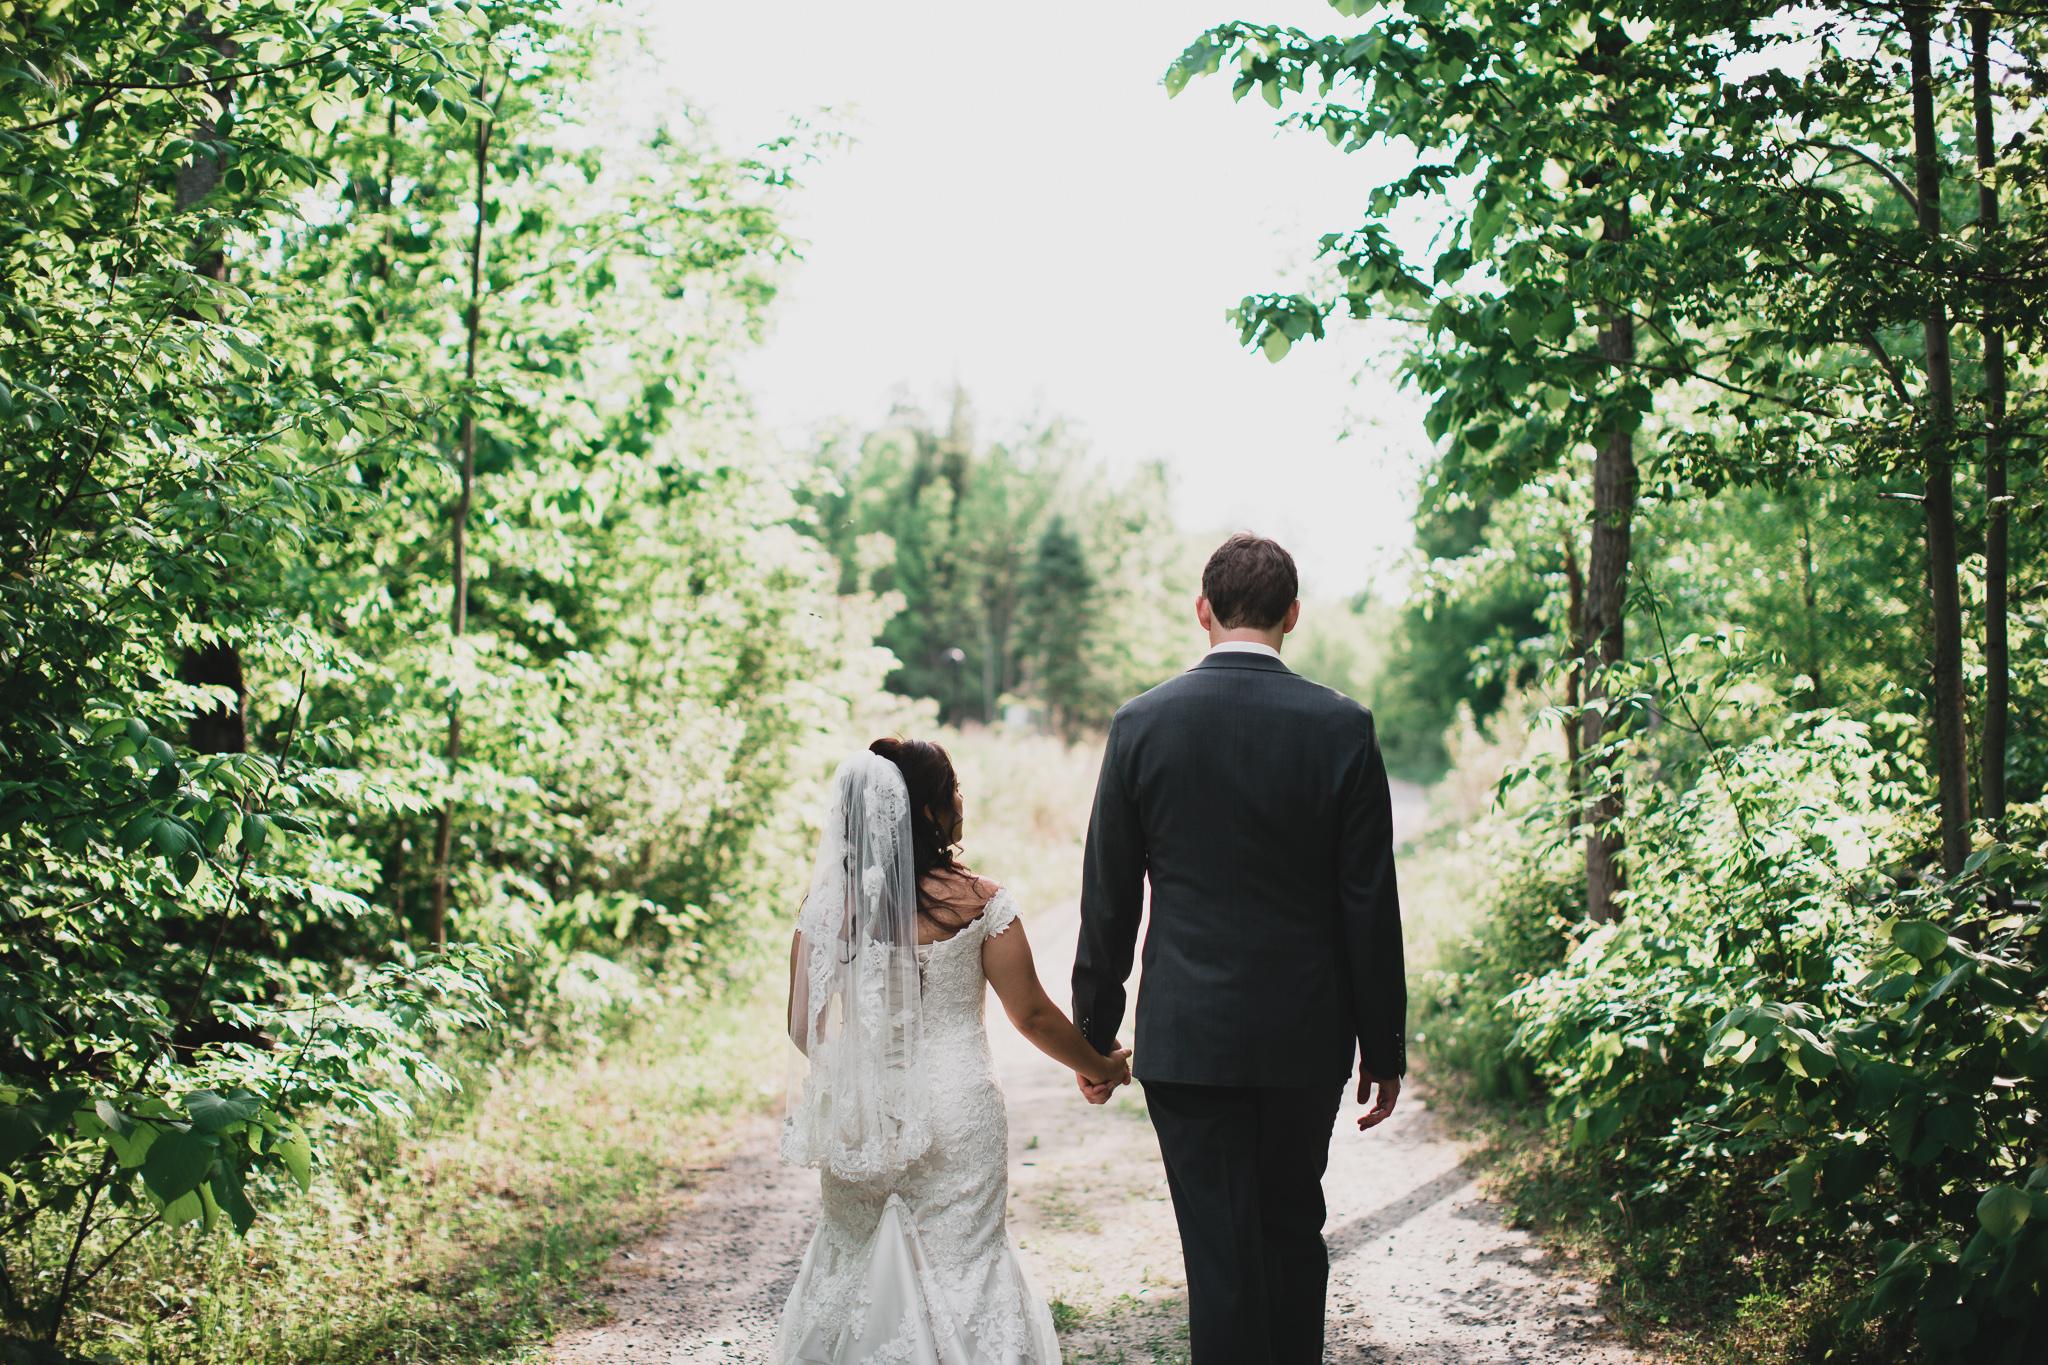 Outdoorsy weddings in Ottawa area